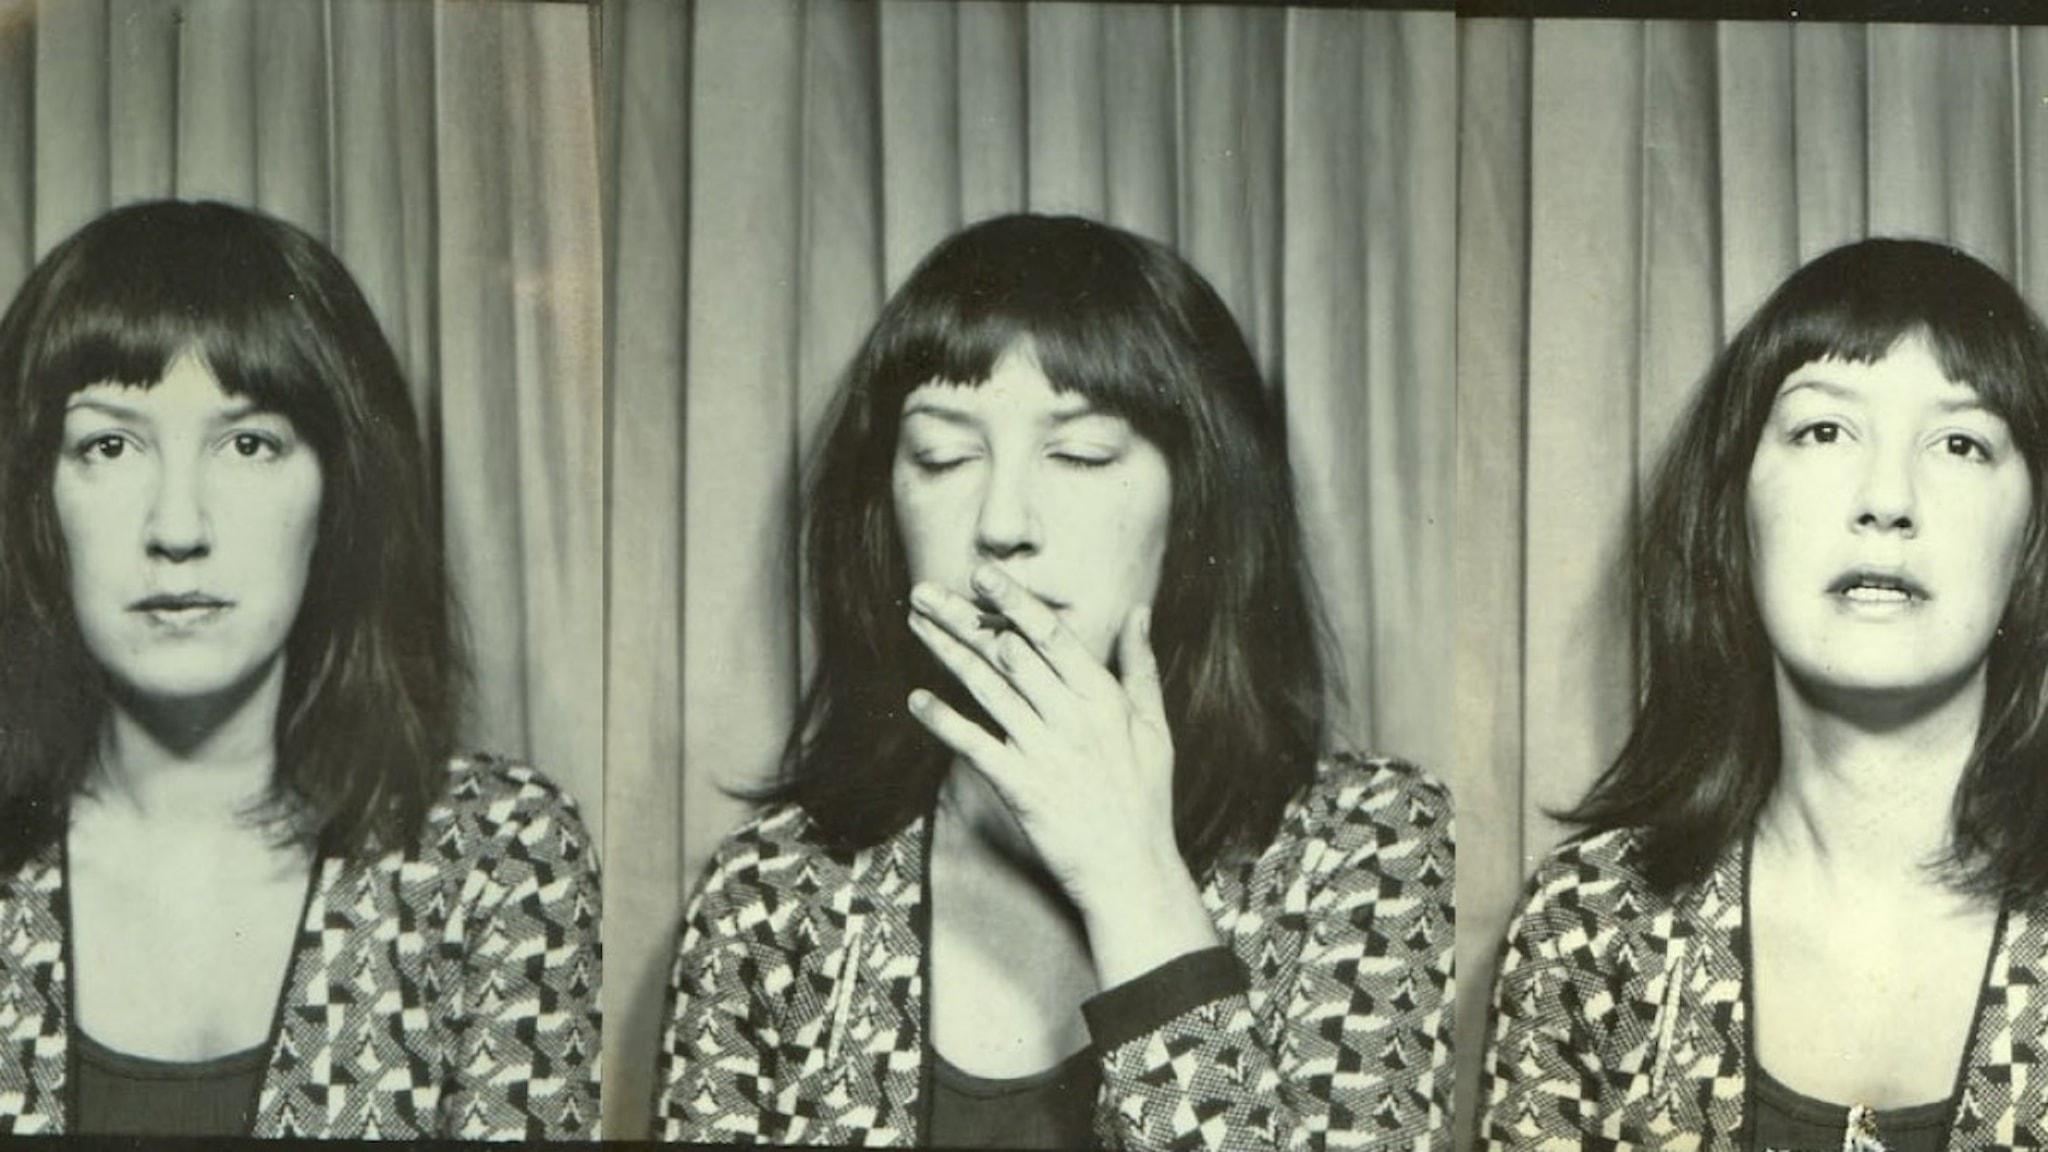 Eve Babitz i fotoautomat. Foto: Mirandi Babitz Collection